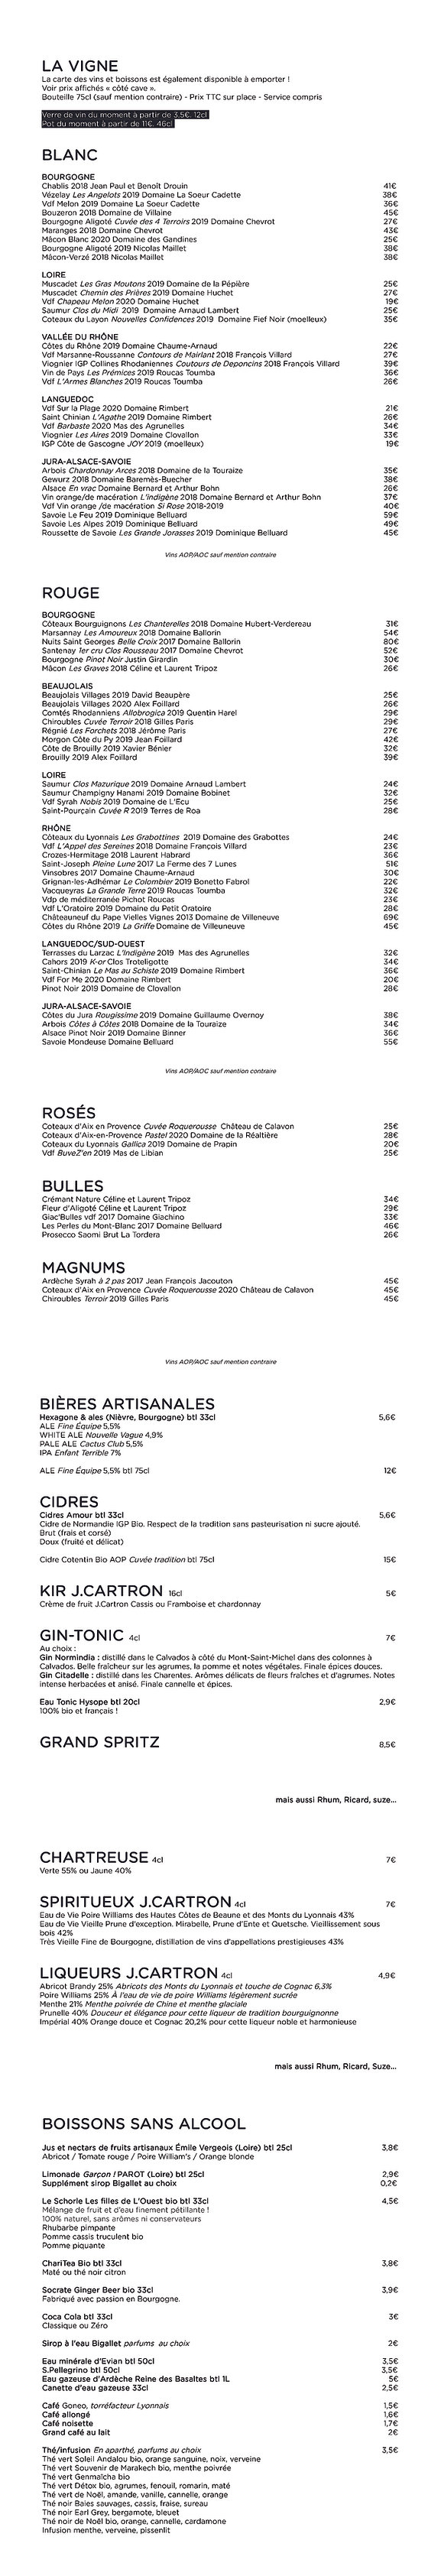 Carte des boissons2-01.jpg